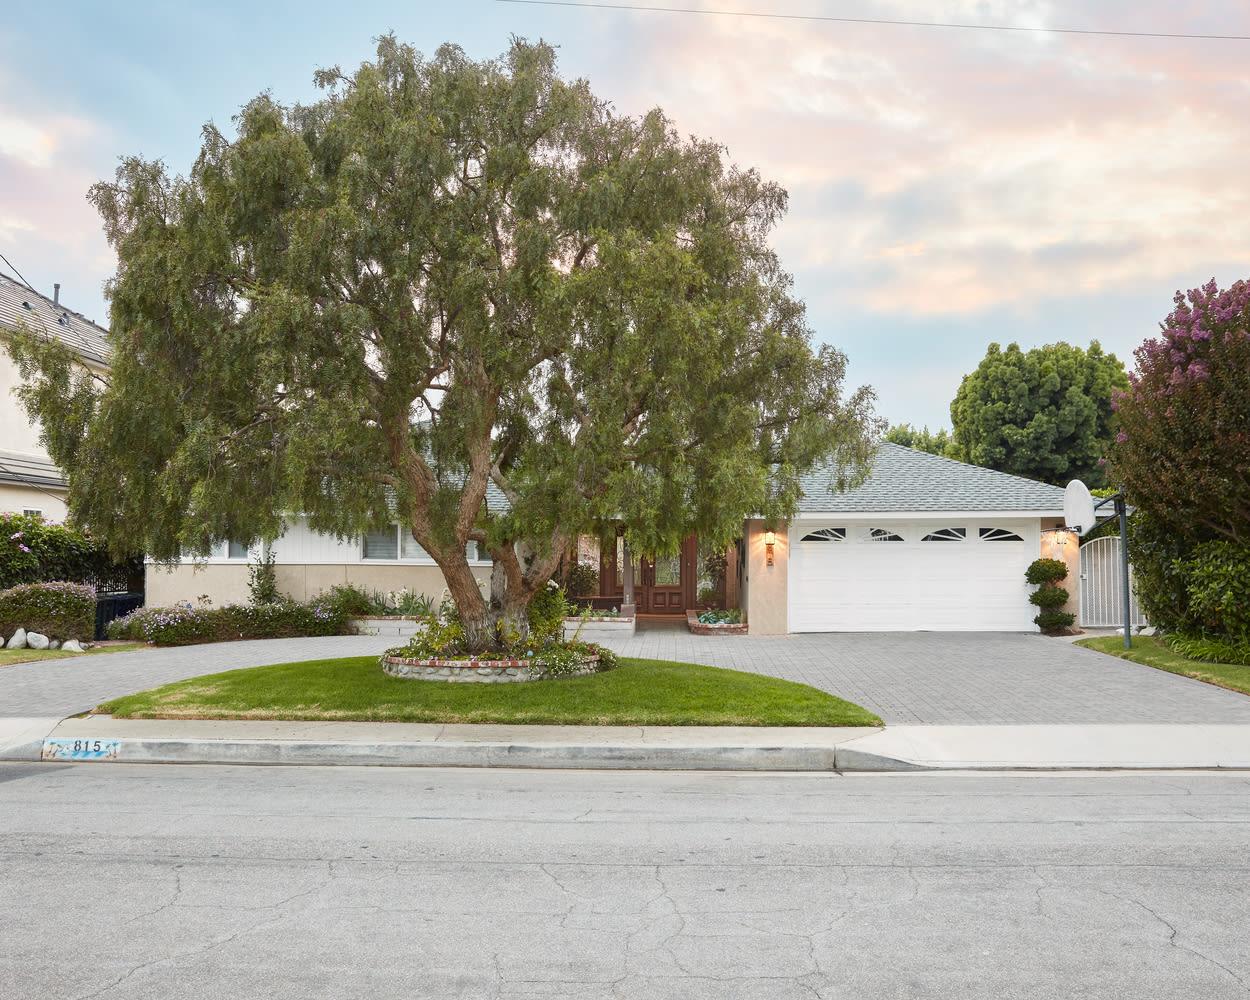 815 California St photo